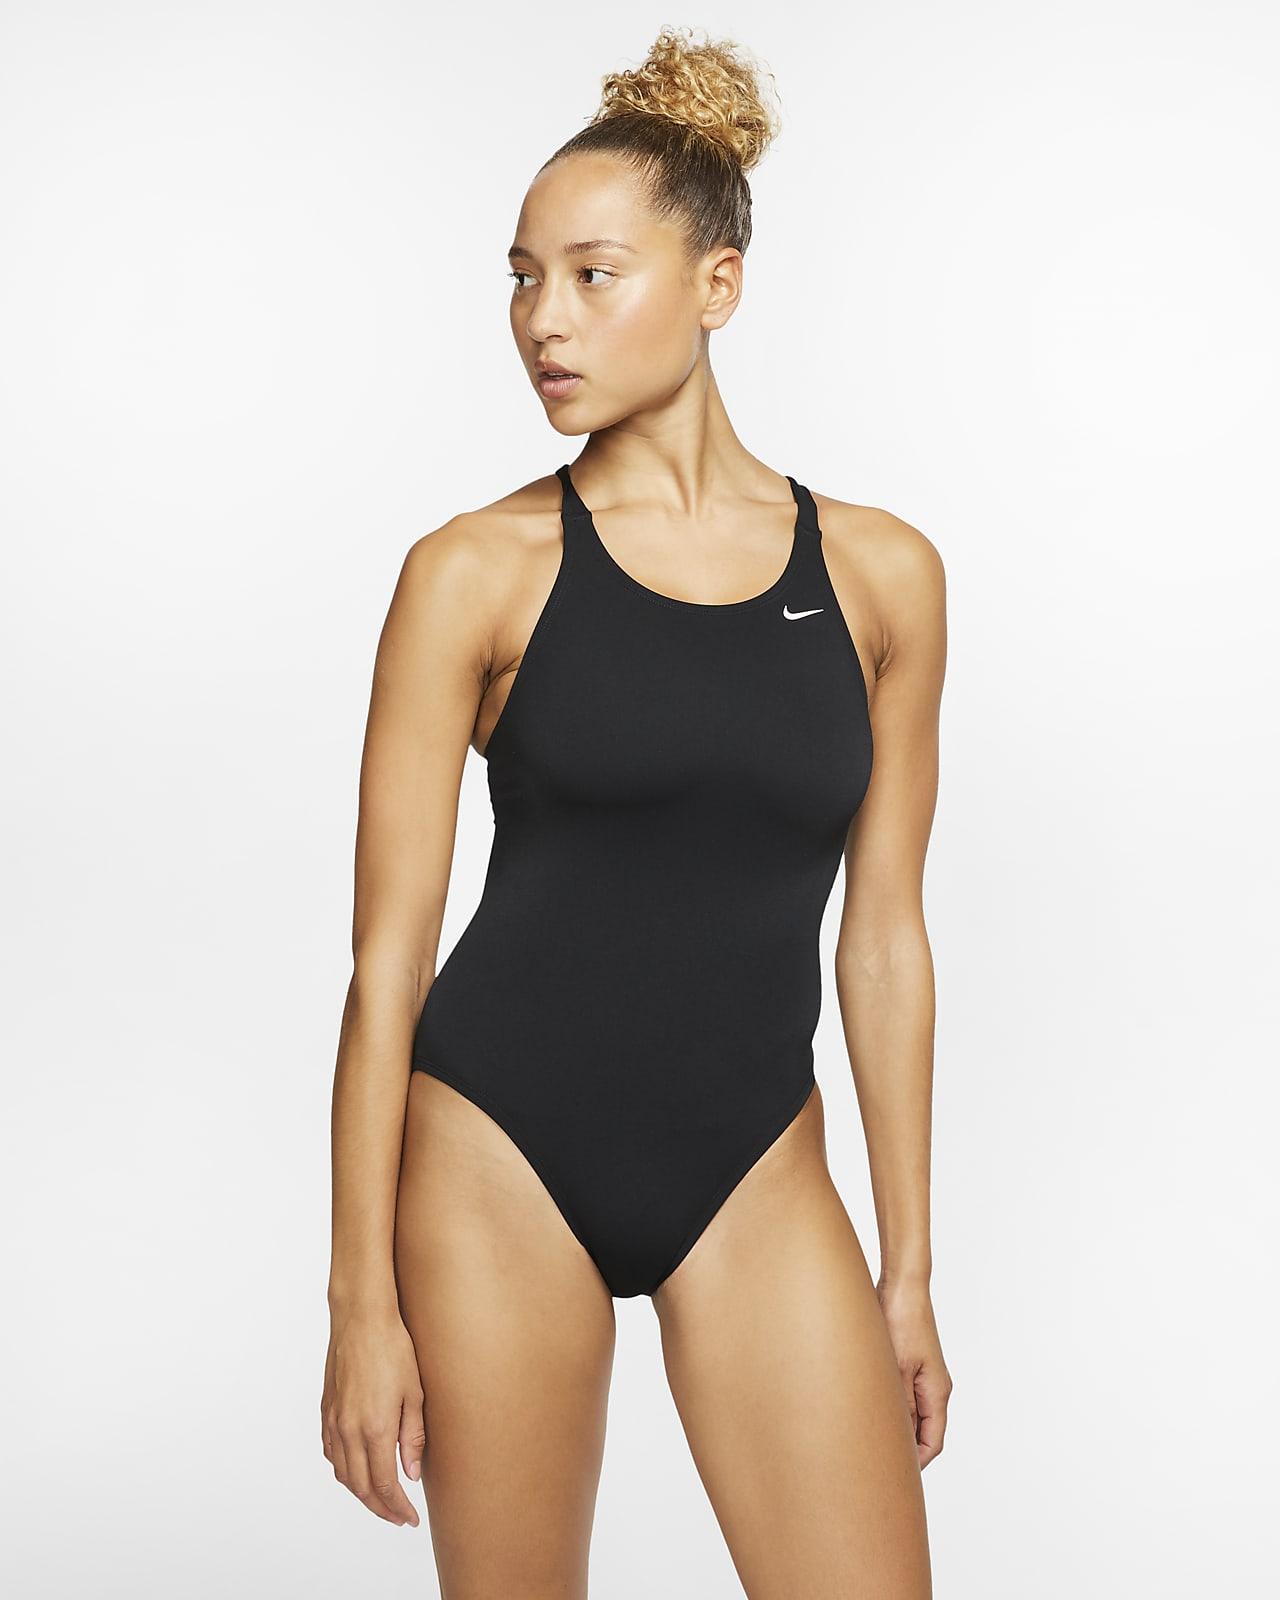 Nike Poly Solid einteiliger Fastback-Badeanzug für Damen